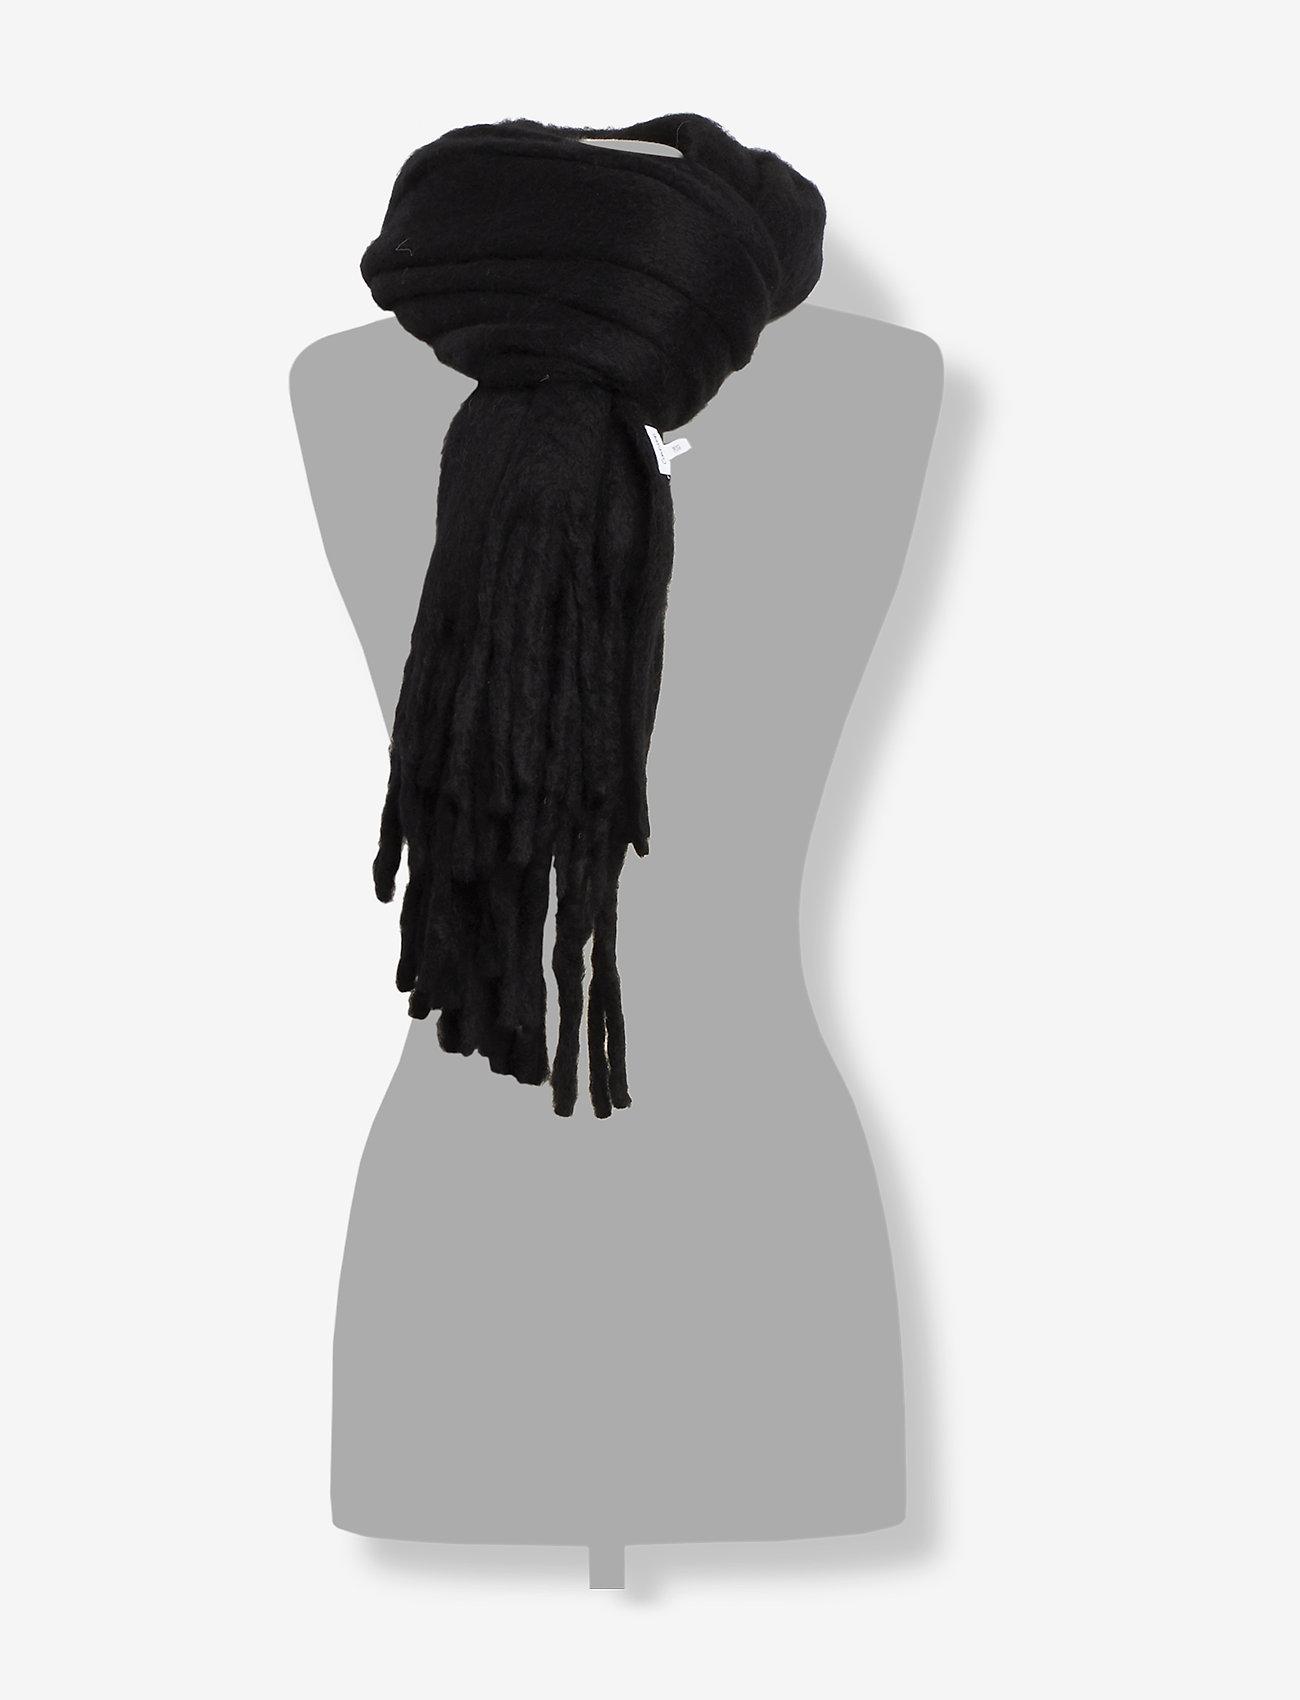 Calvin Klein - BOILED SCARF - sjalar & halsdukar - black - 1